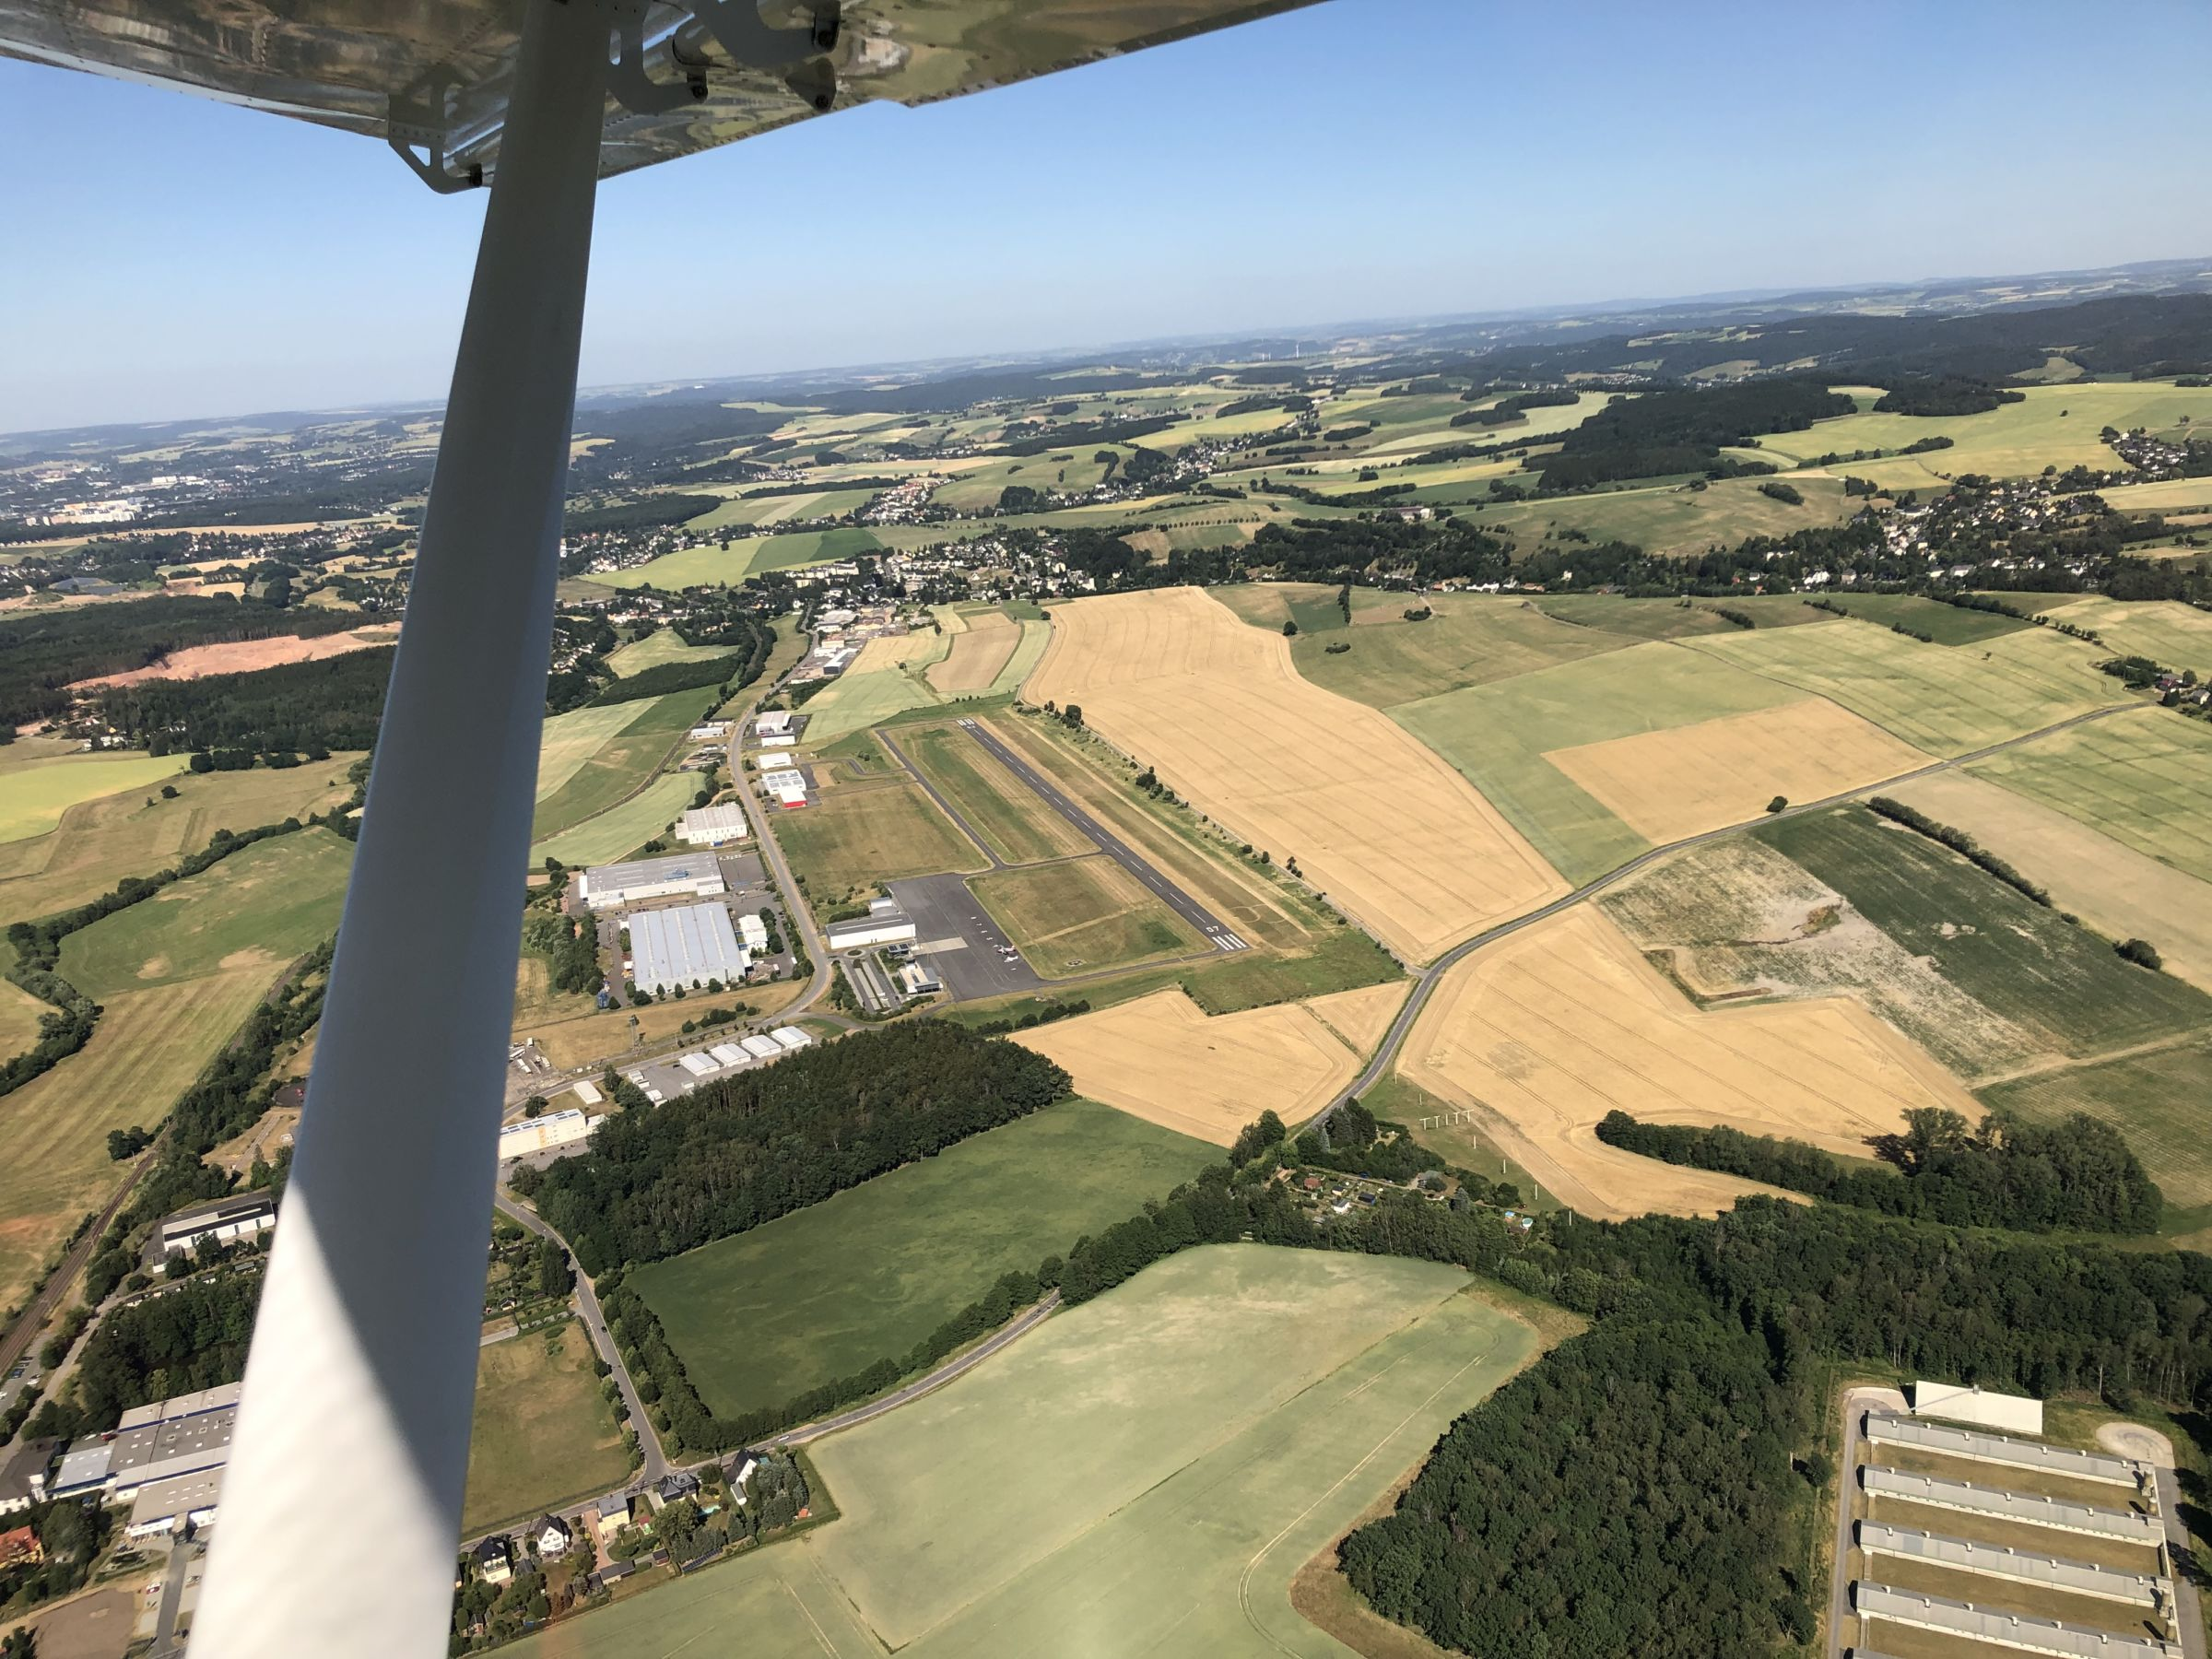 Flugplatz Chemnitz-Jahnsdorf